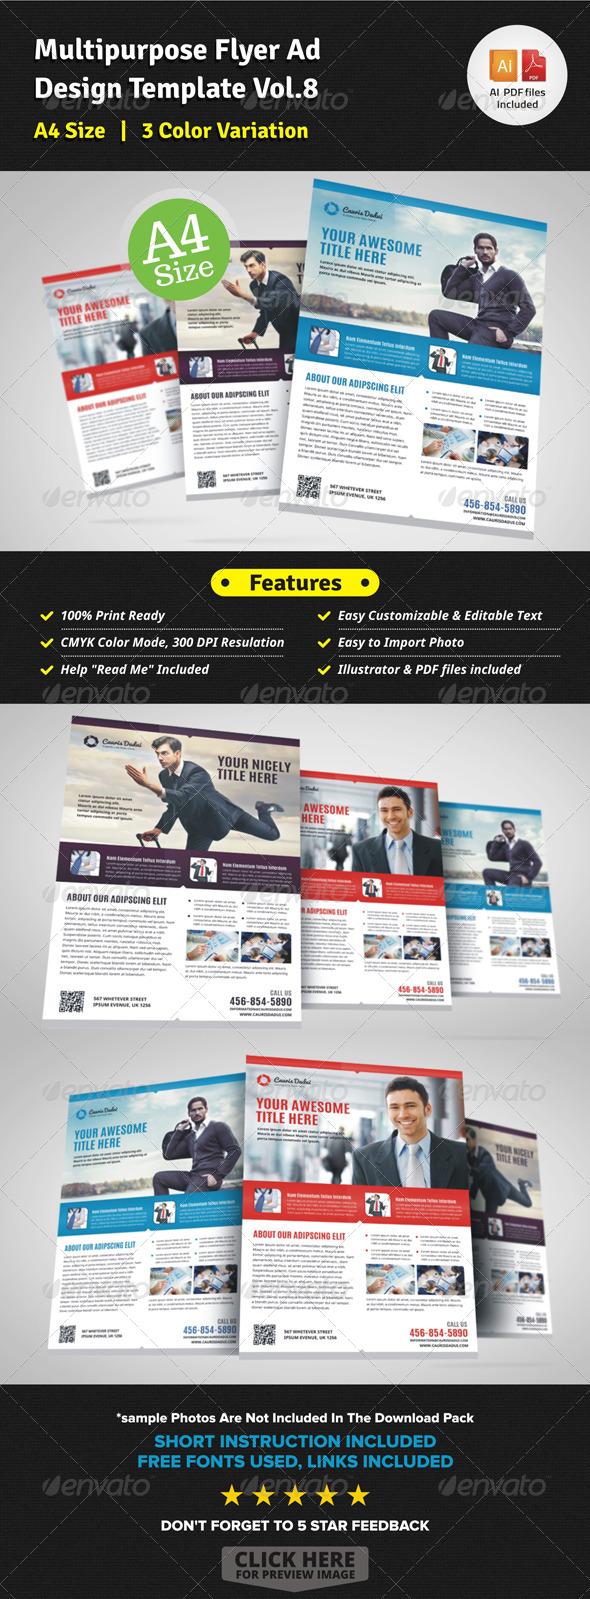 Multipurpose Business Flyer Template Vol.8 - Corporate Flyers